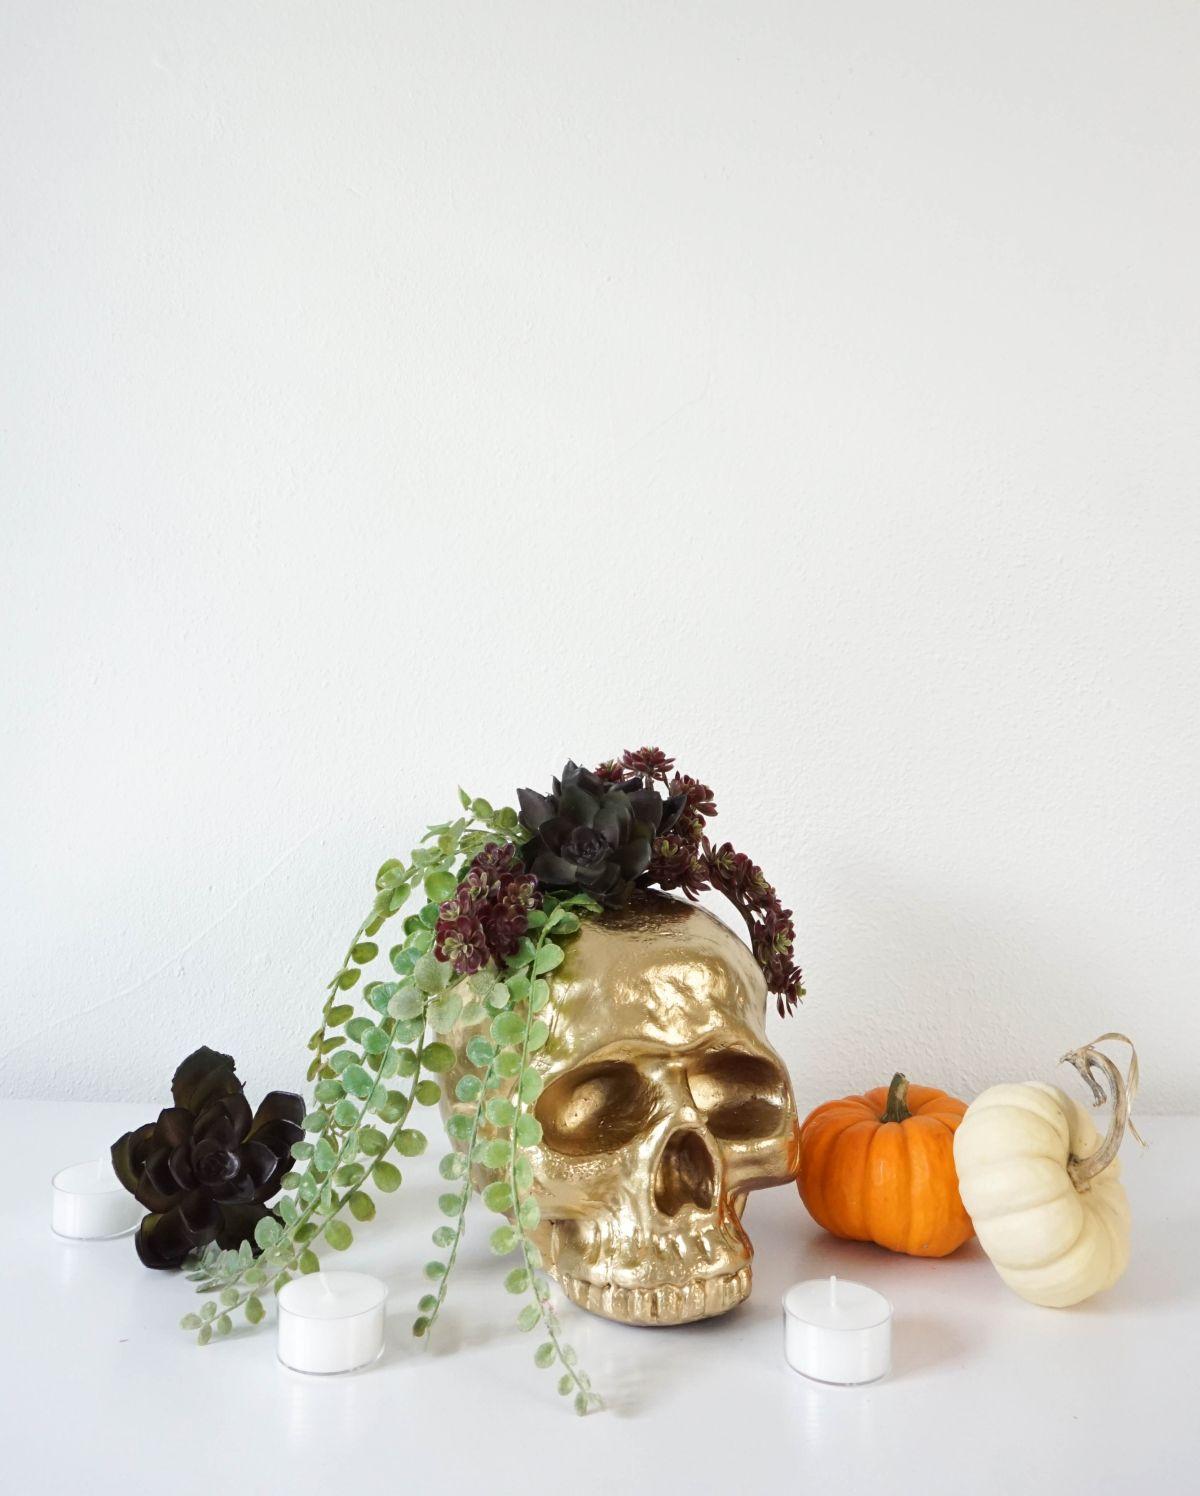 DIY Gilded Skull Vase - Centerpiece for Halloween